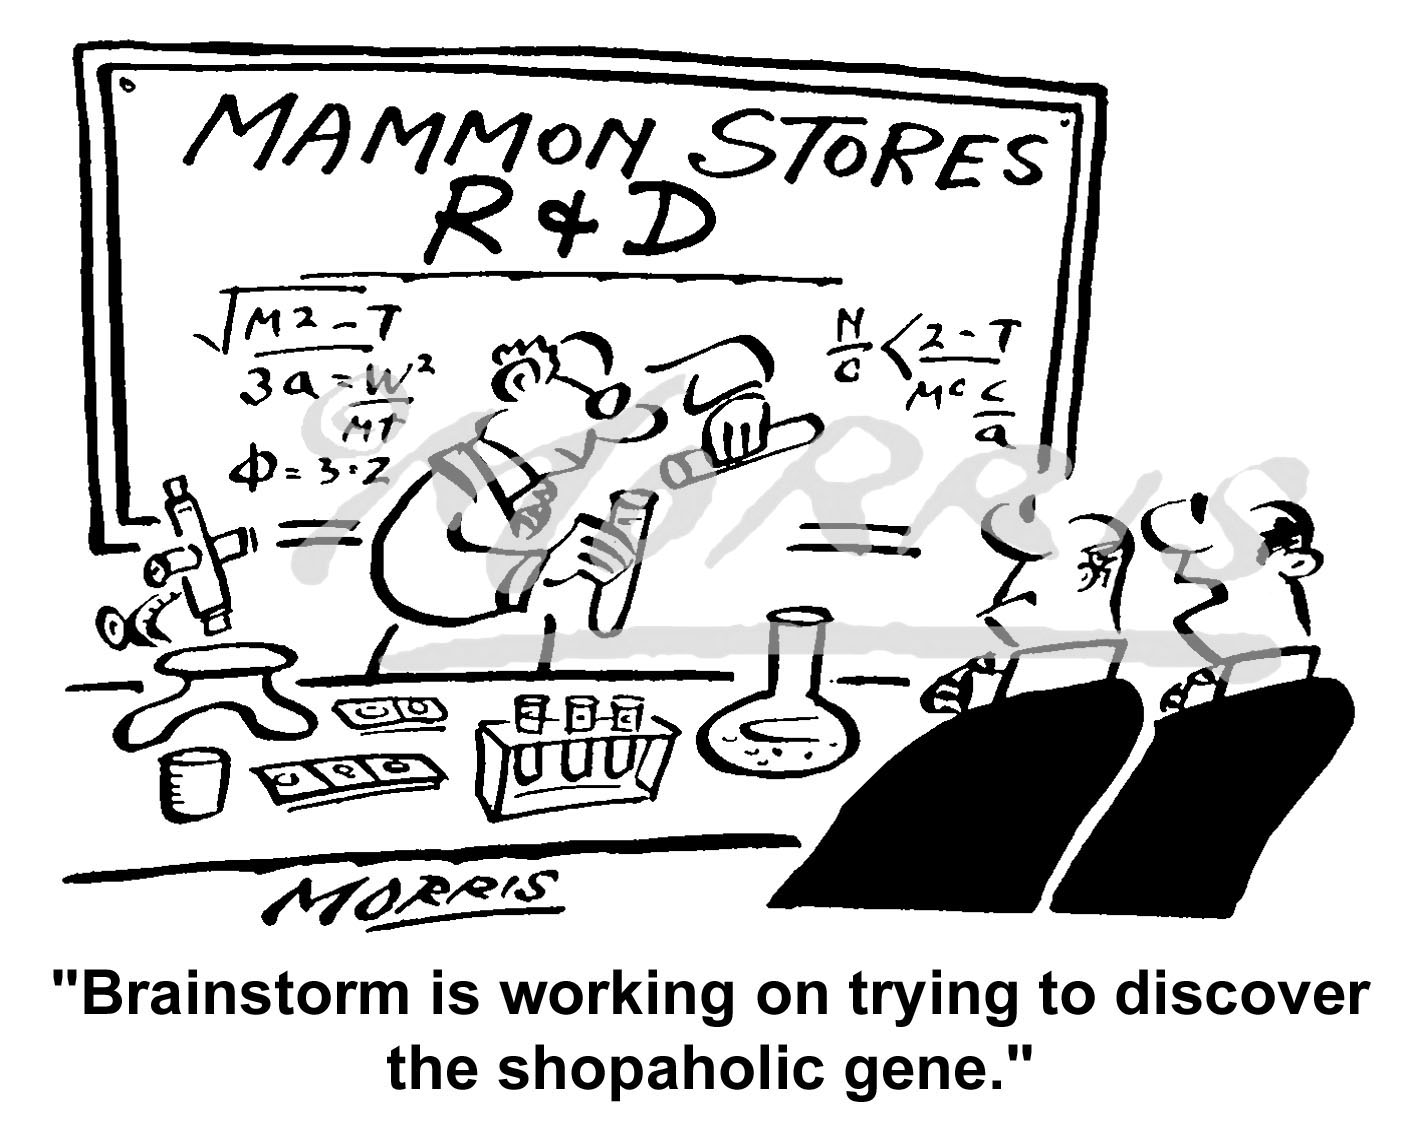 Research and Development cartoon – Ref: 2918bw